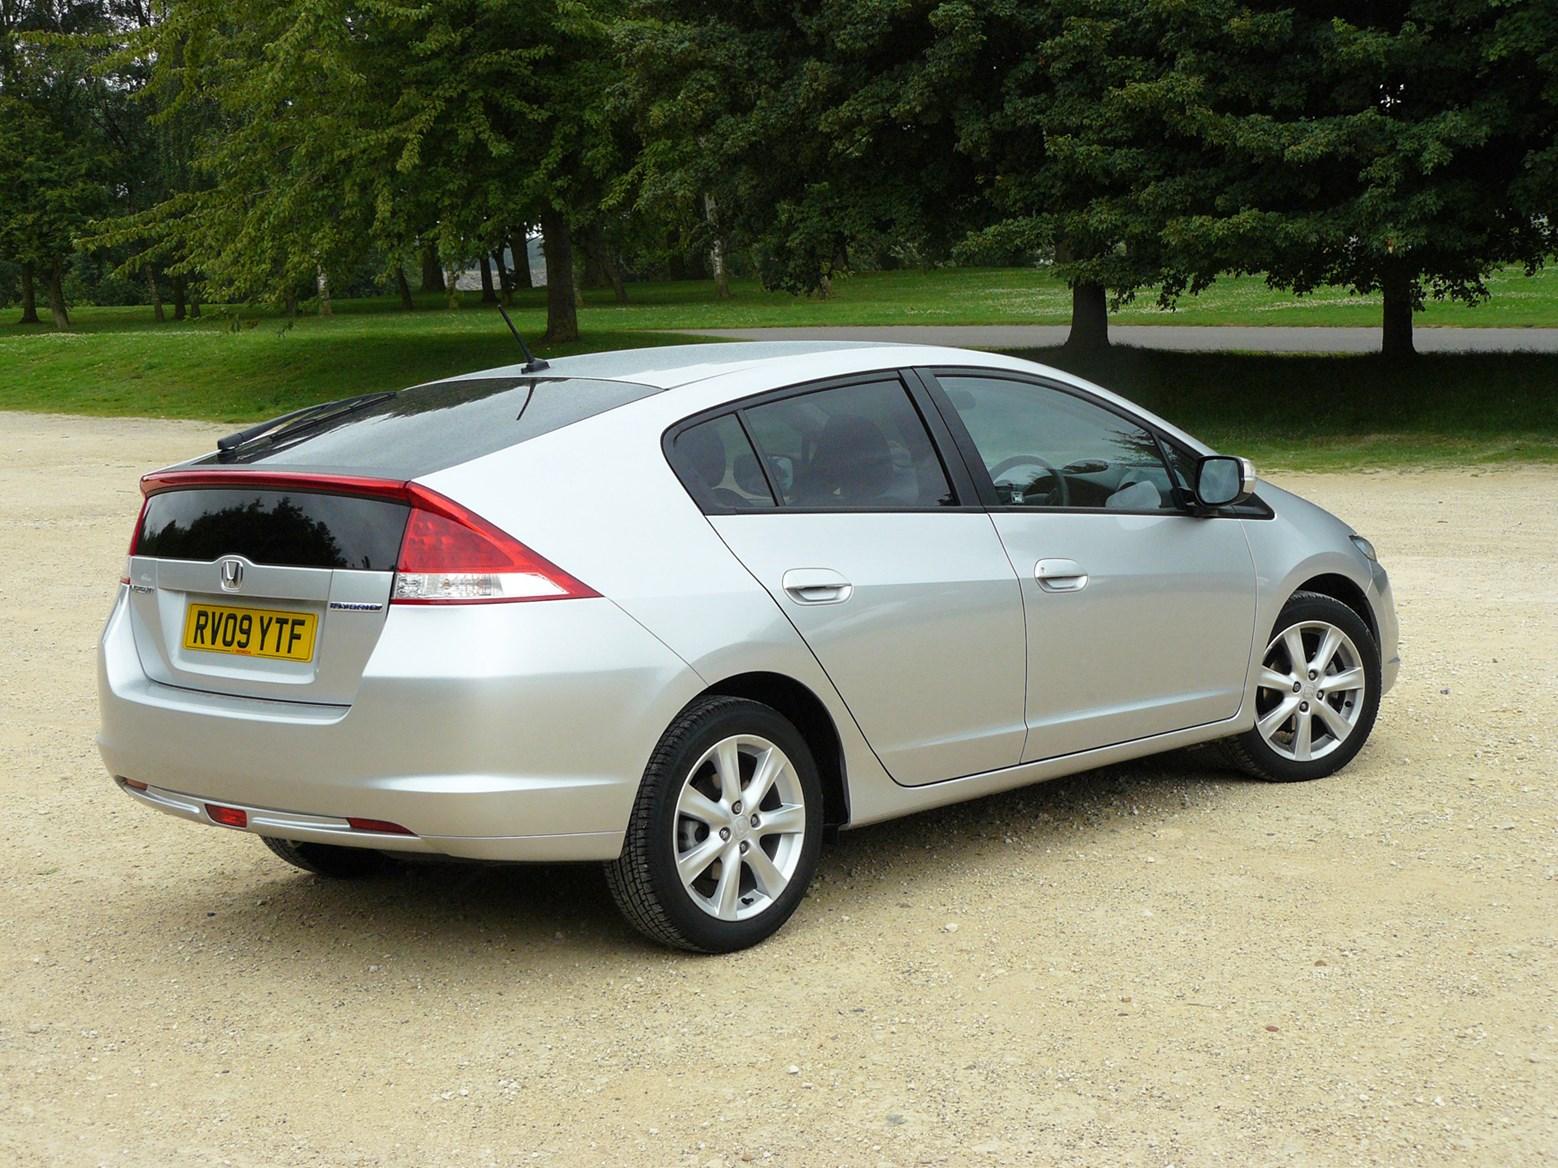 Honda Insight Hatchback Review (2009 - 2014) | Parkers